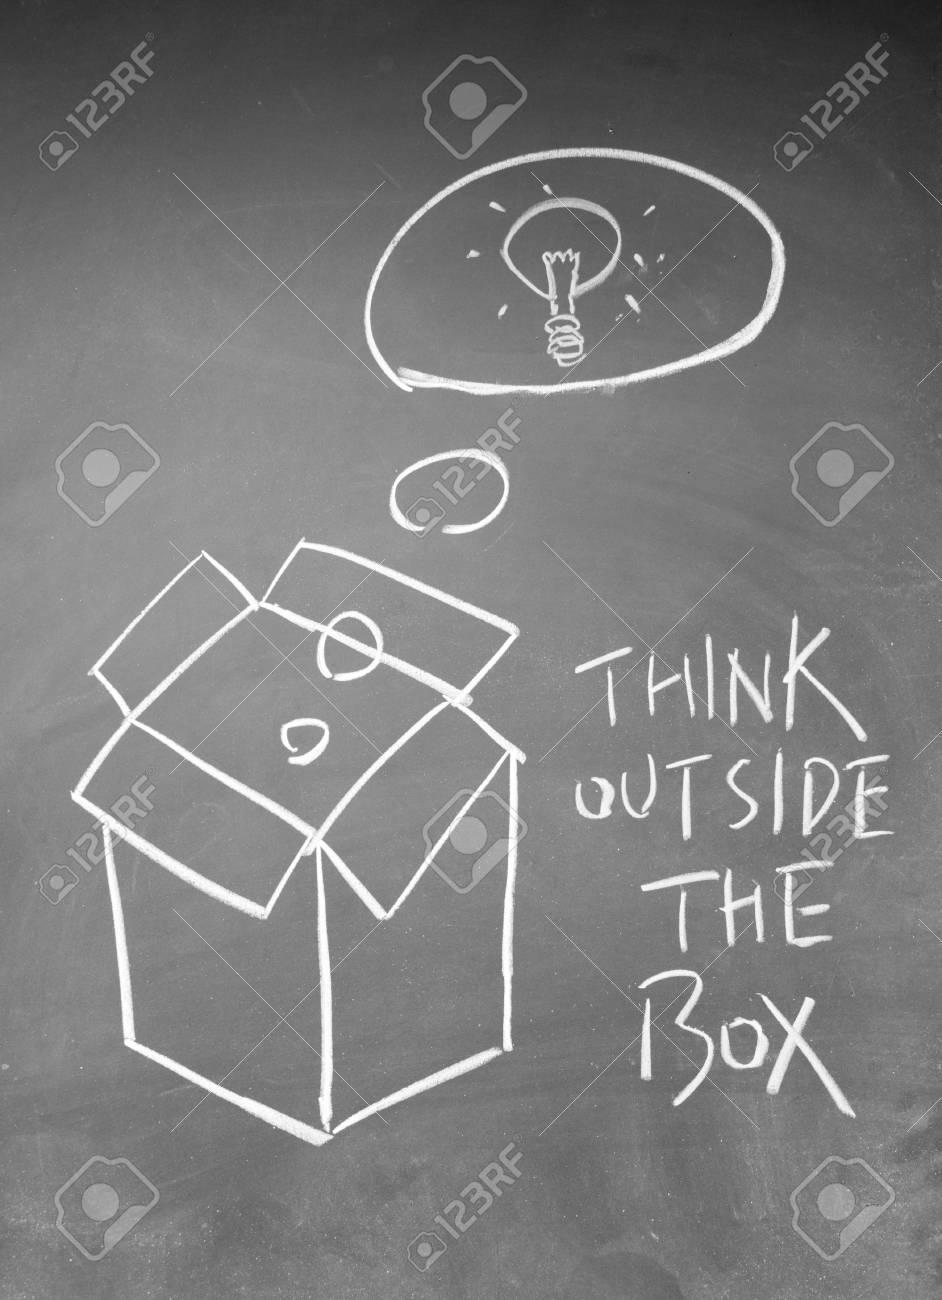 think outside the box symbol Stock Photo - 13833848